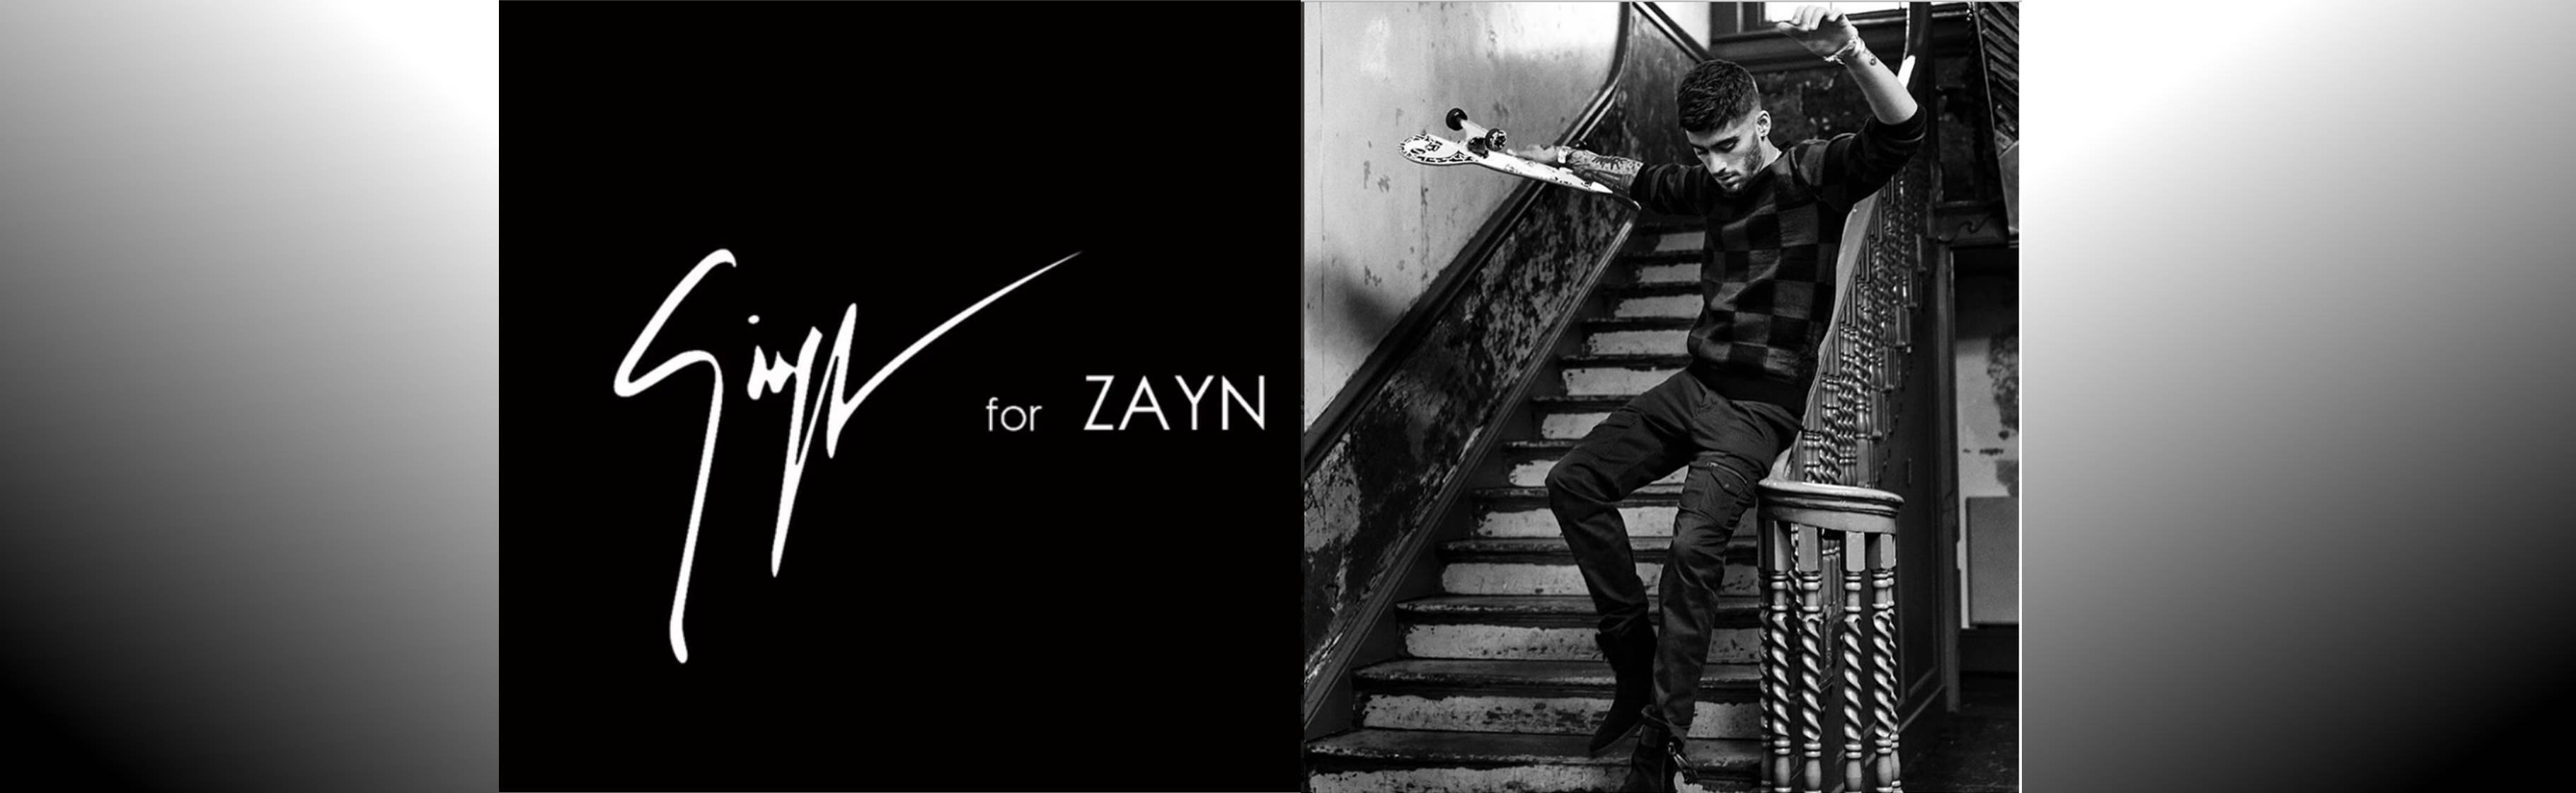 Zayn Malik's Career Takes a New Direction